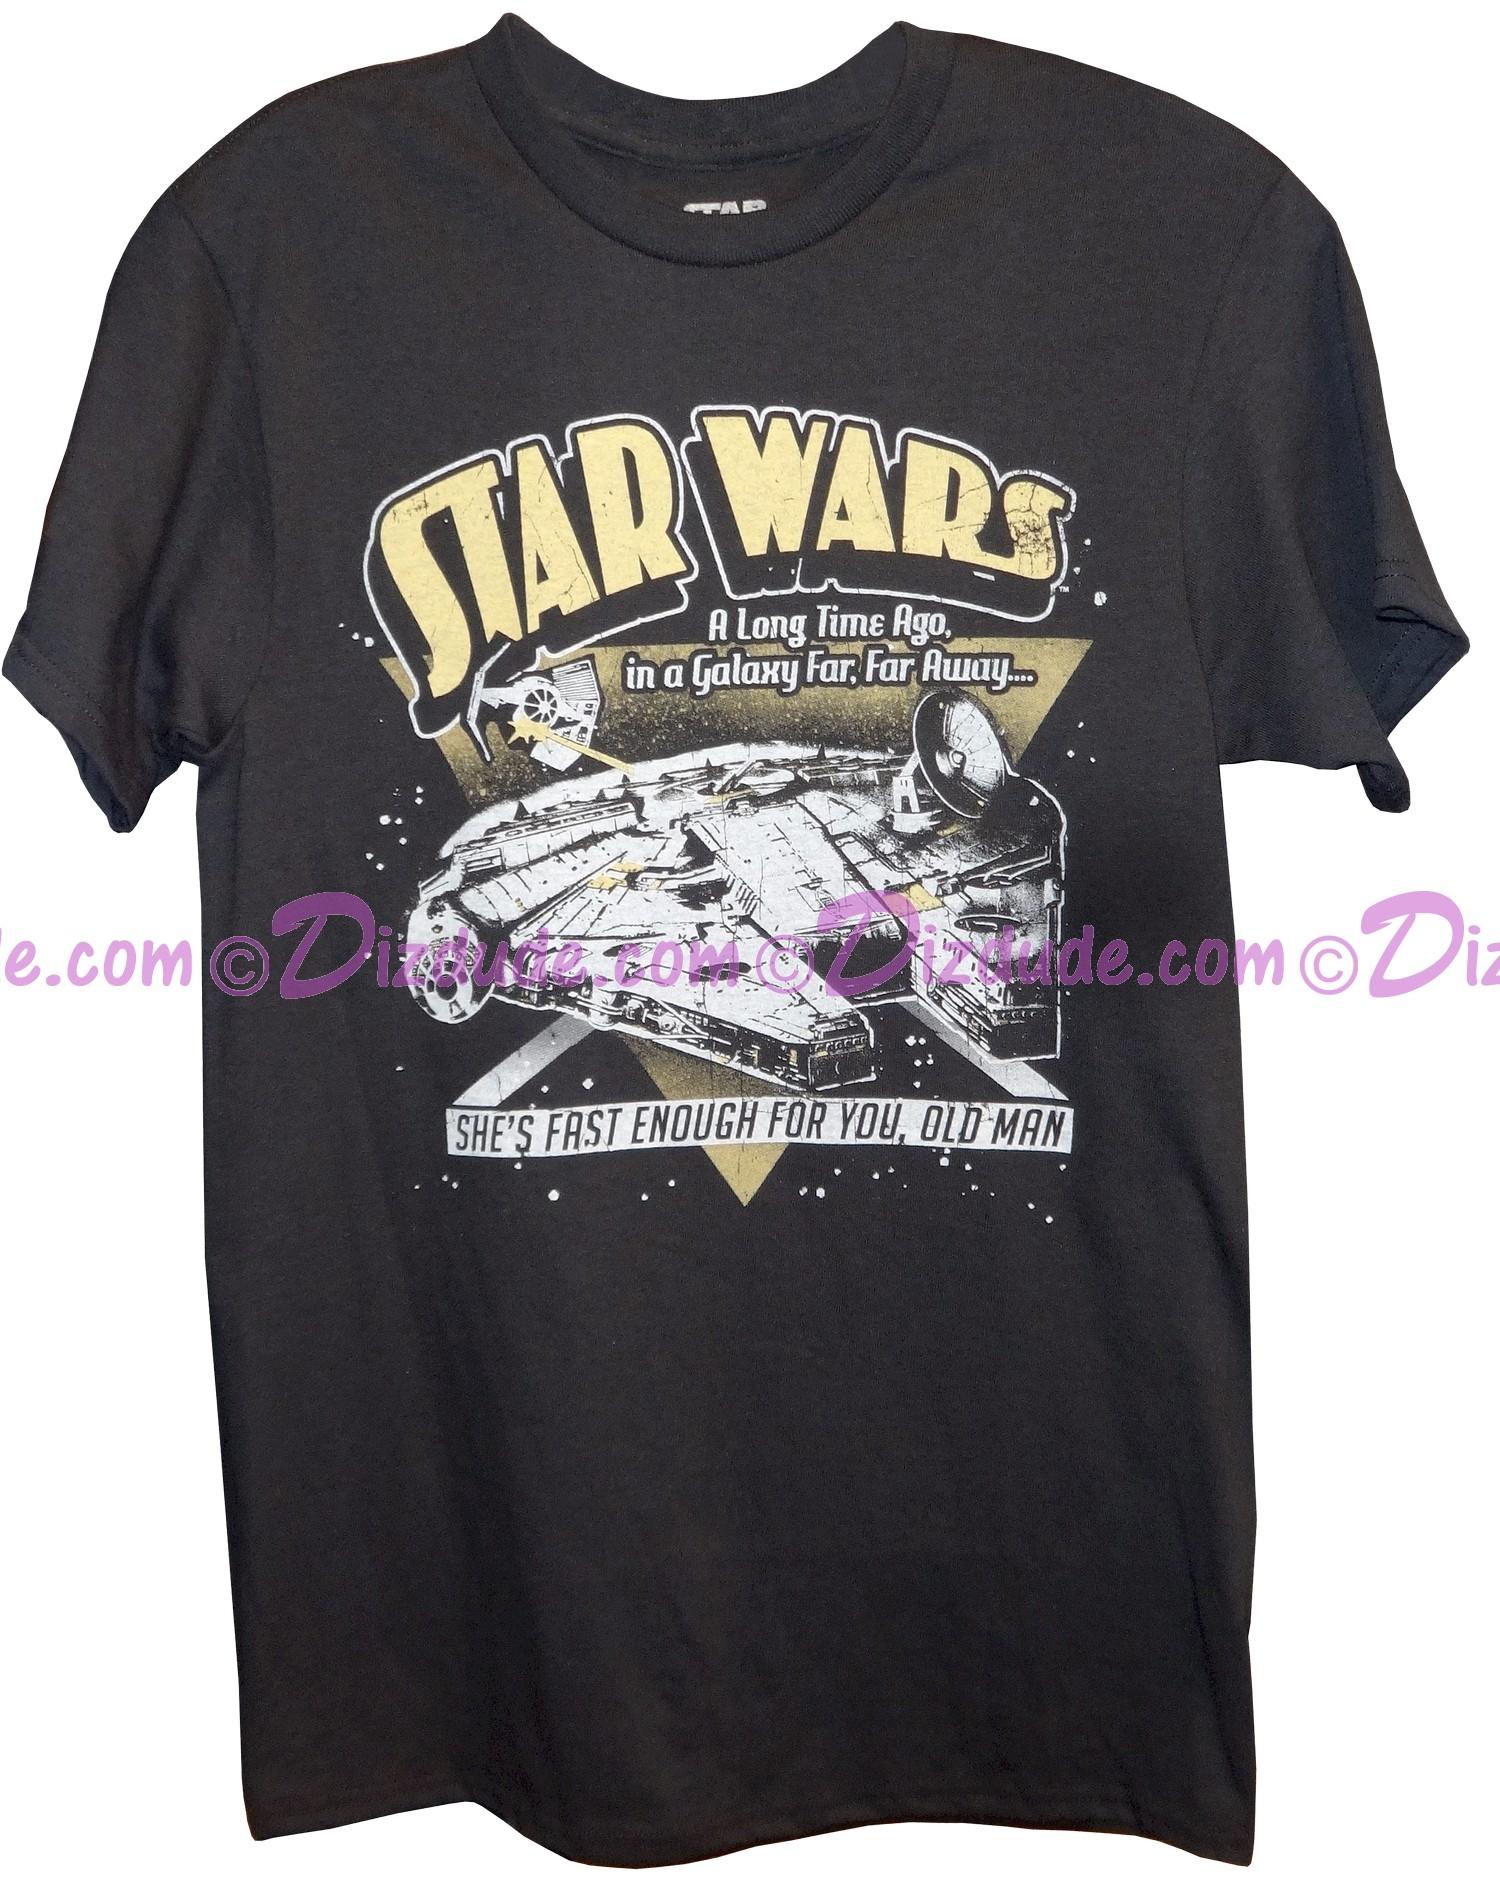 Disney Star Wars Millennium Falcon She's Fast Enough For You Old Man Adult T-Shirt (Tshirt, T shirt or Tee) © Dizdude.com